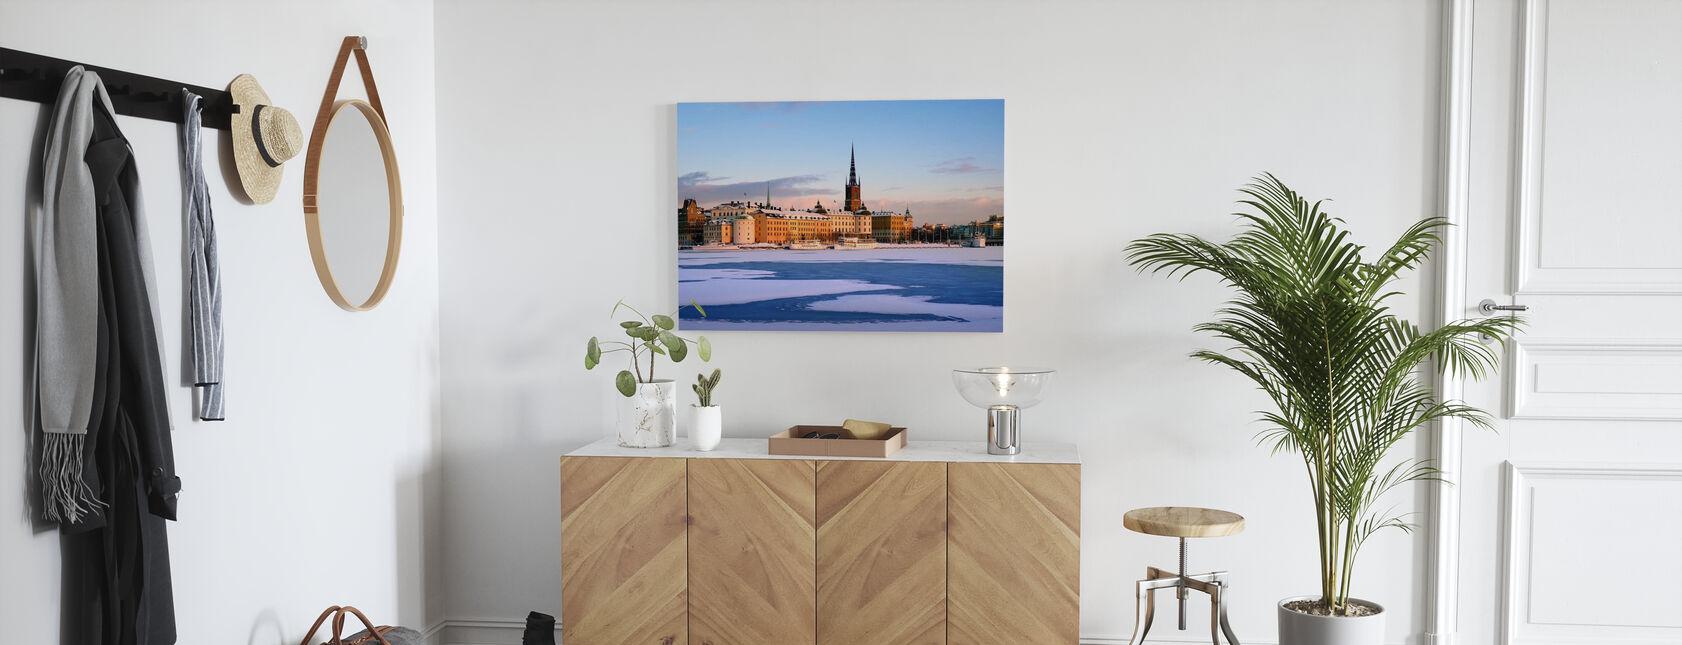 Inverno a Stoccolma, Svezia - Stampa su tela - Sala